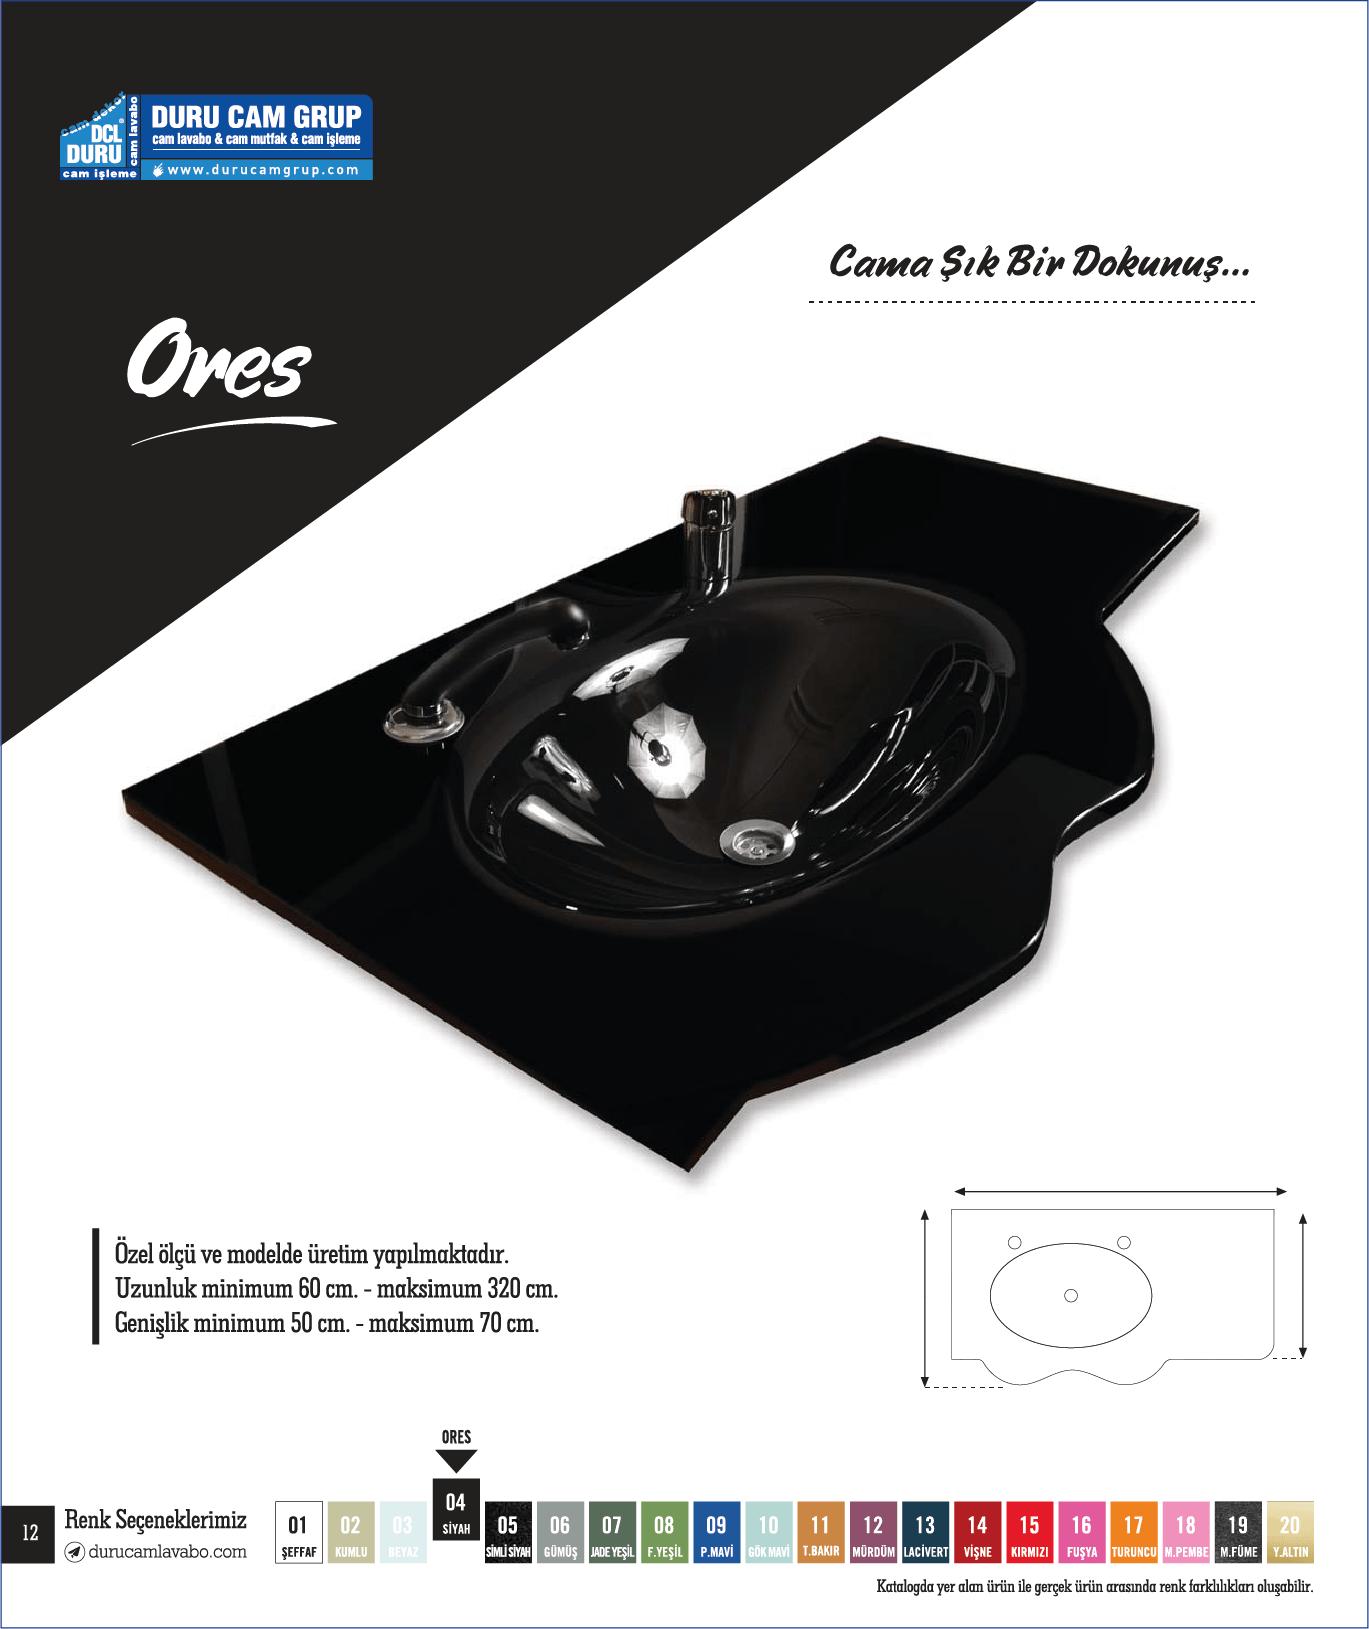 Ores Model